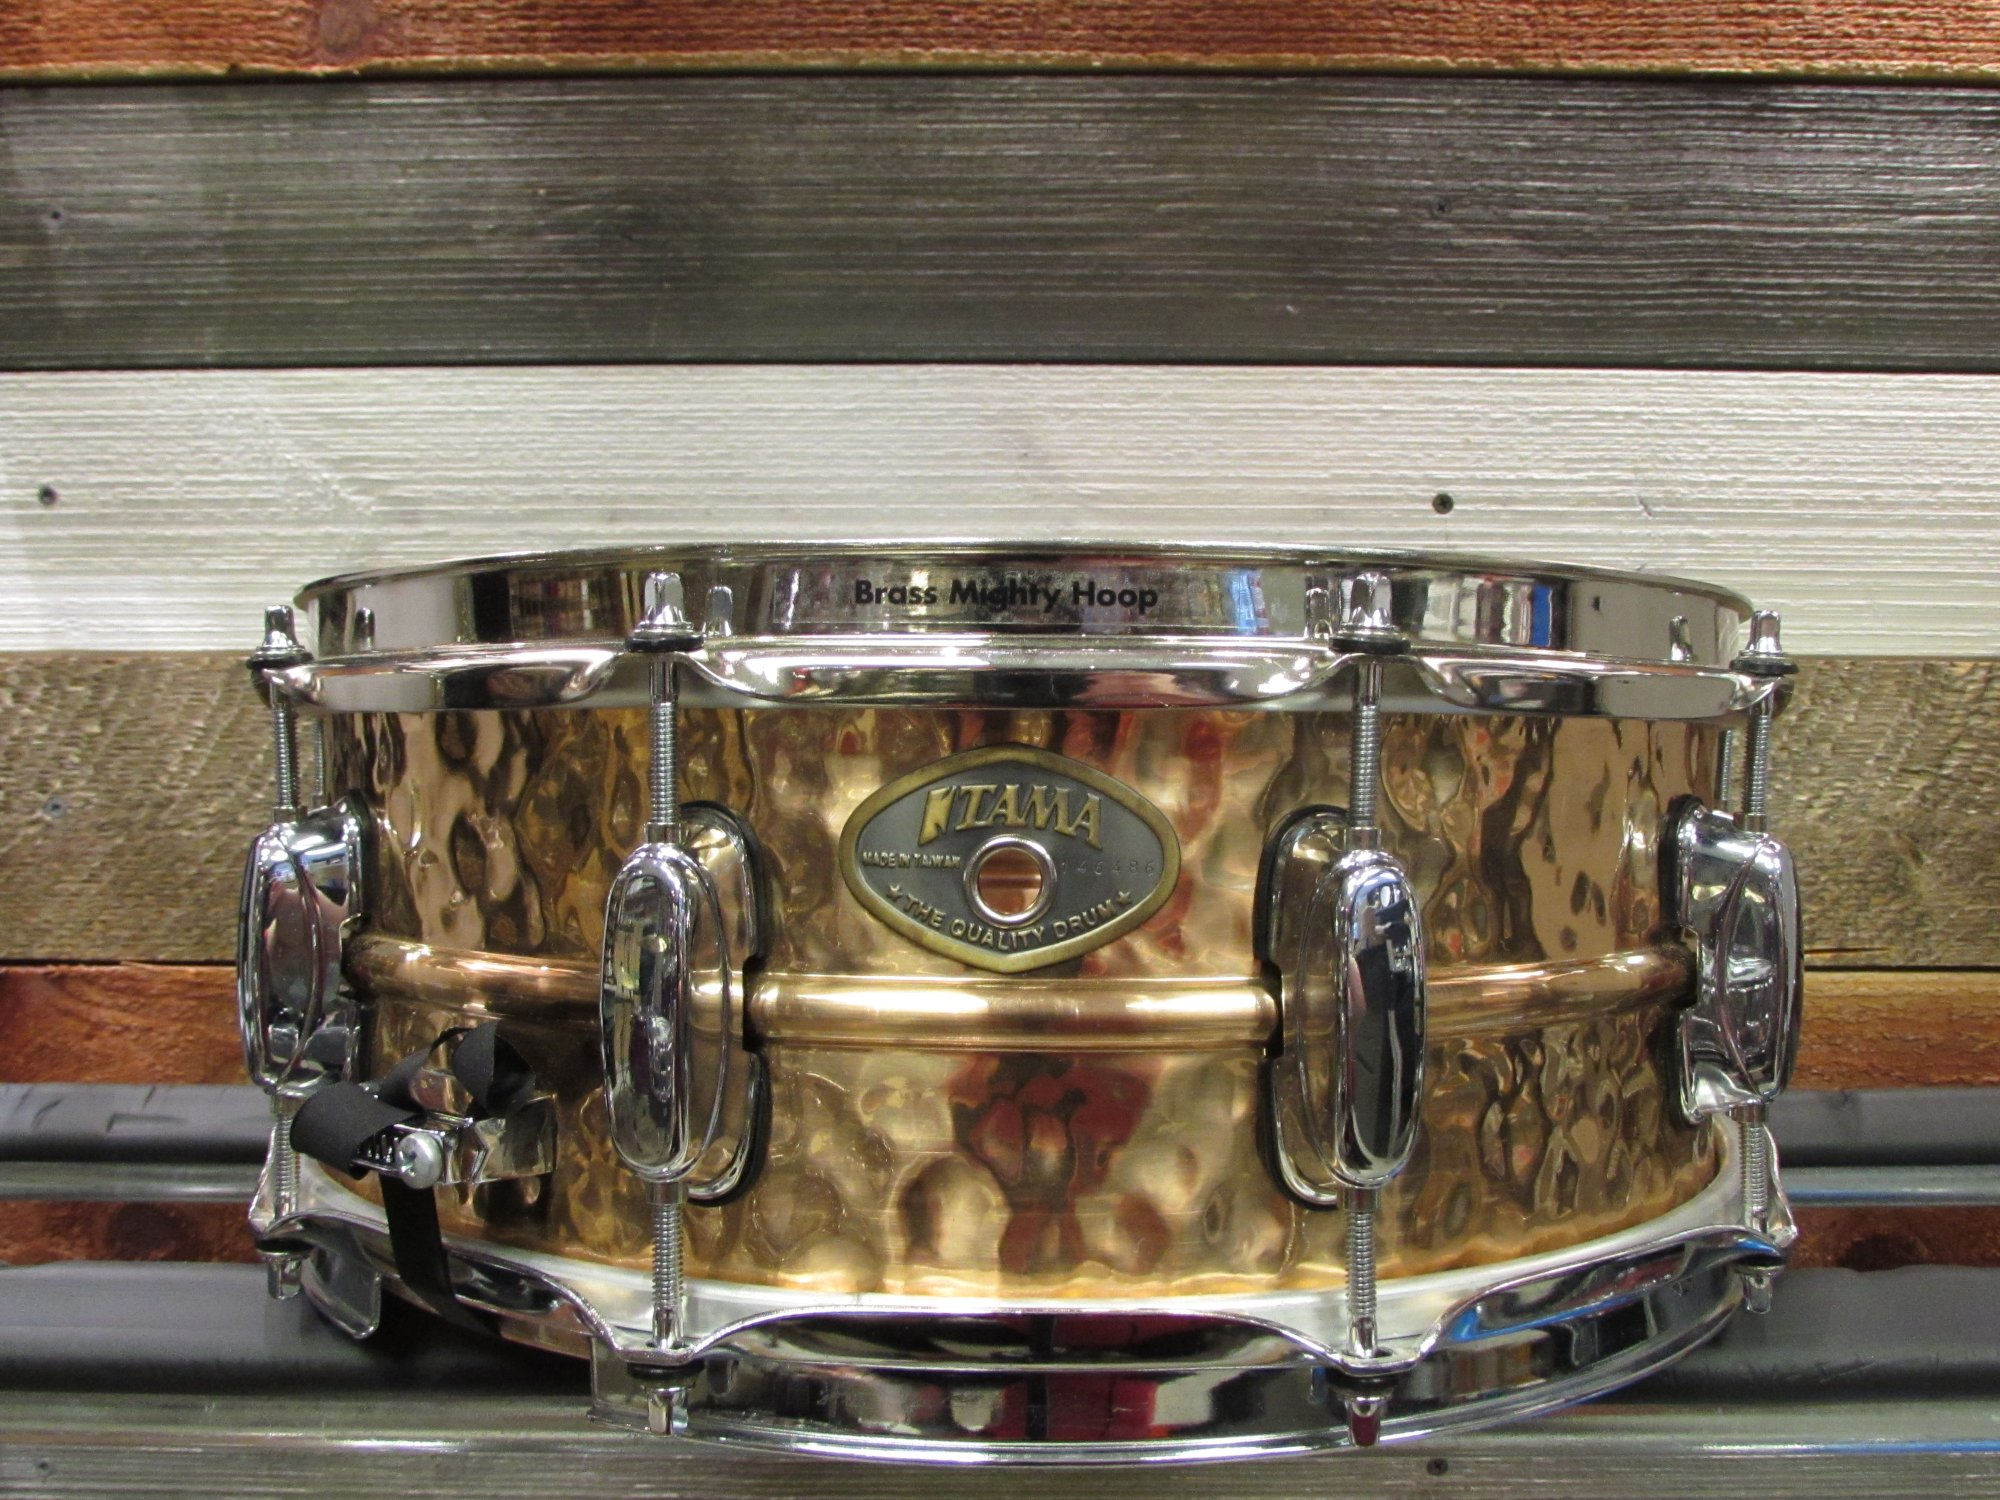 Tama Power Metal Hammered Bronze Snare 5.5 x 14